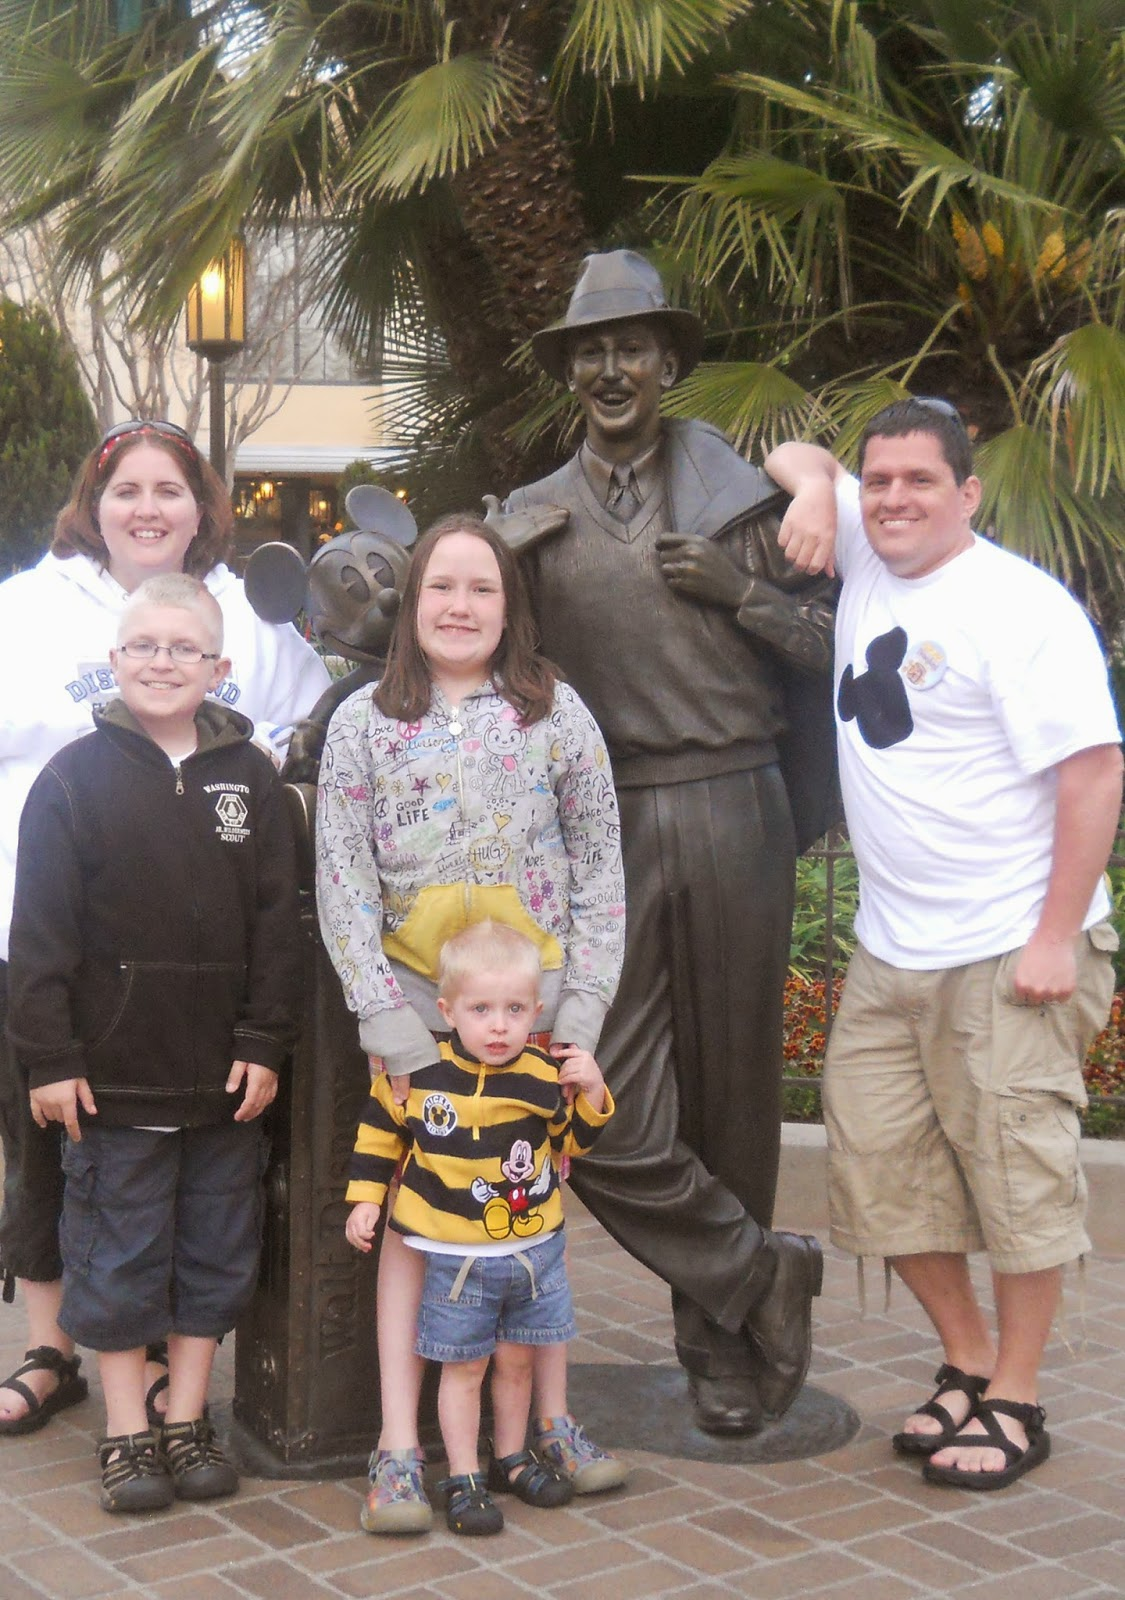 Iconic Disneyland Resort photo locations from LoveOurDisney.com